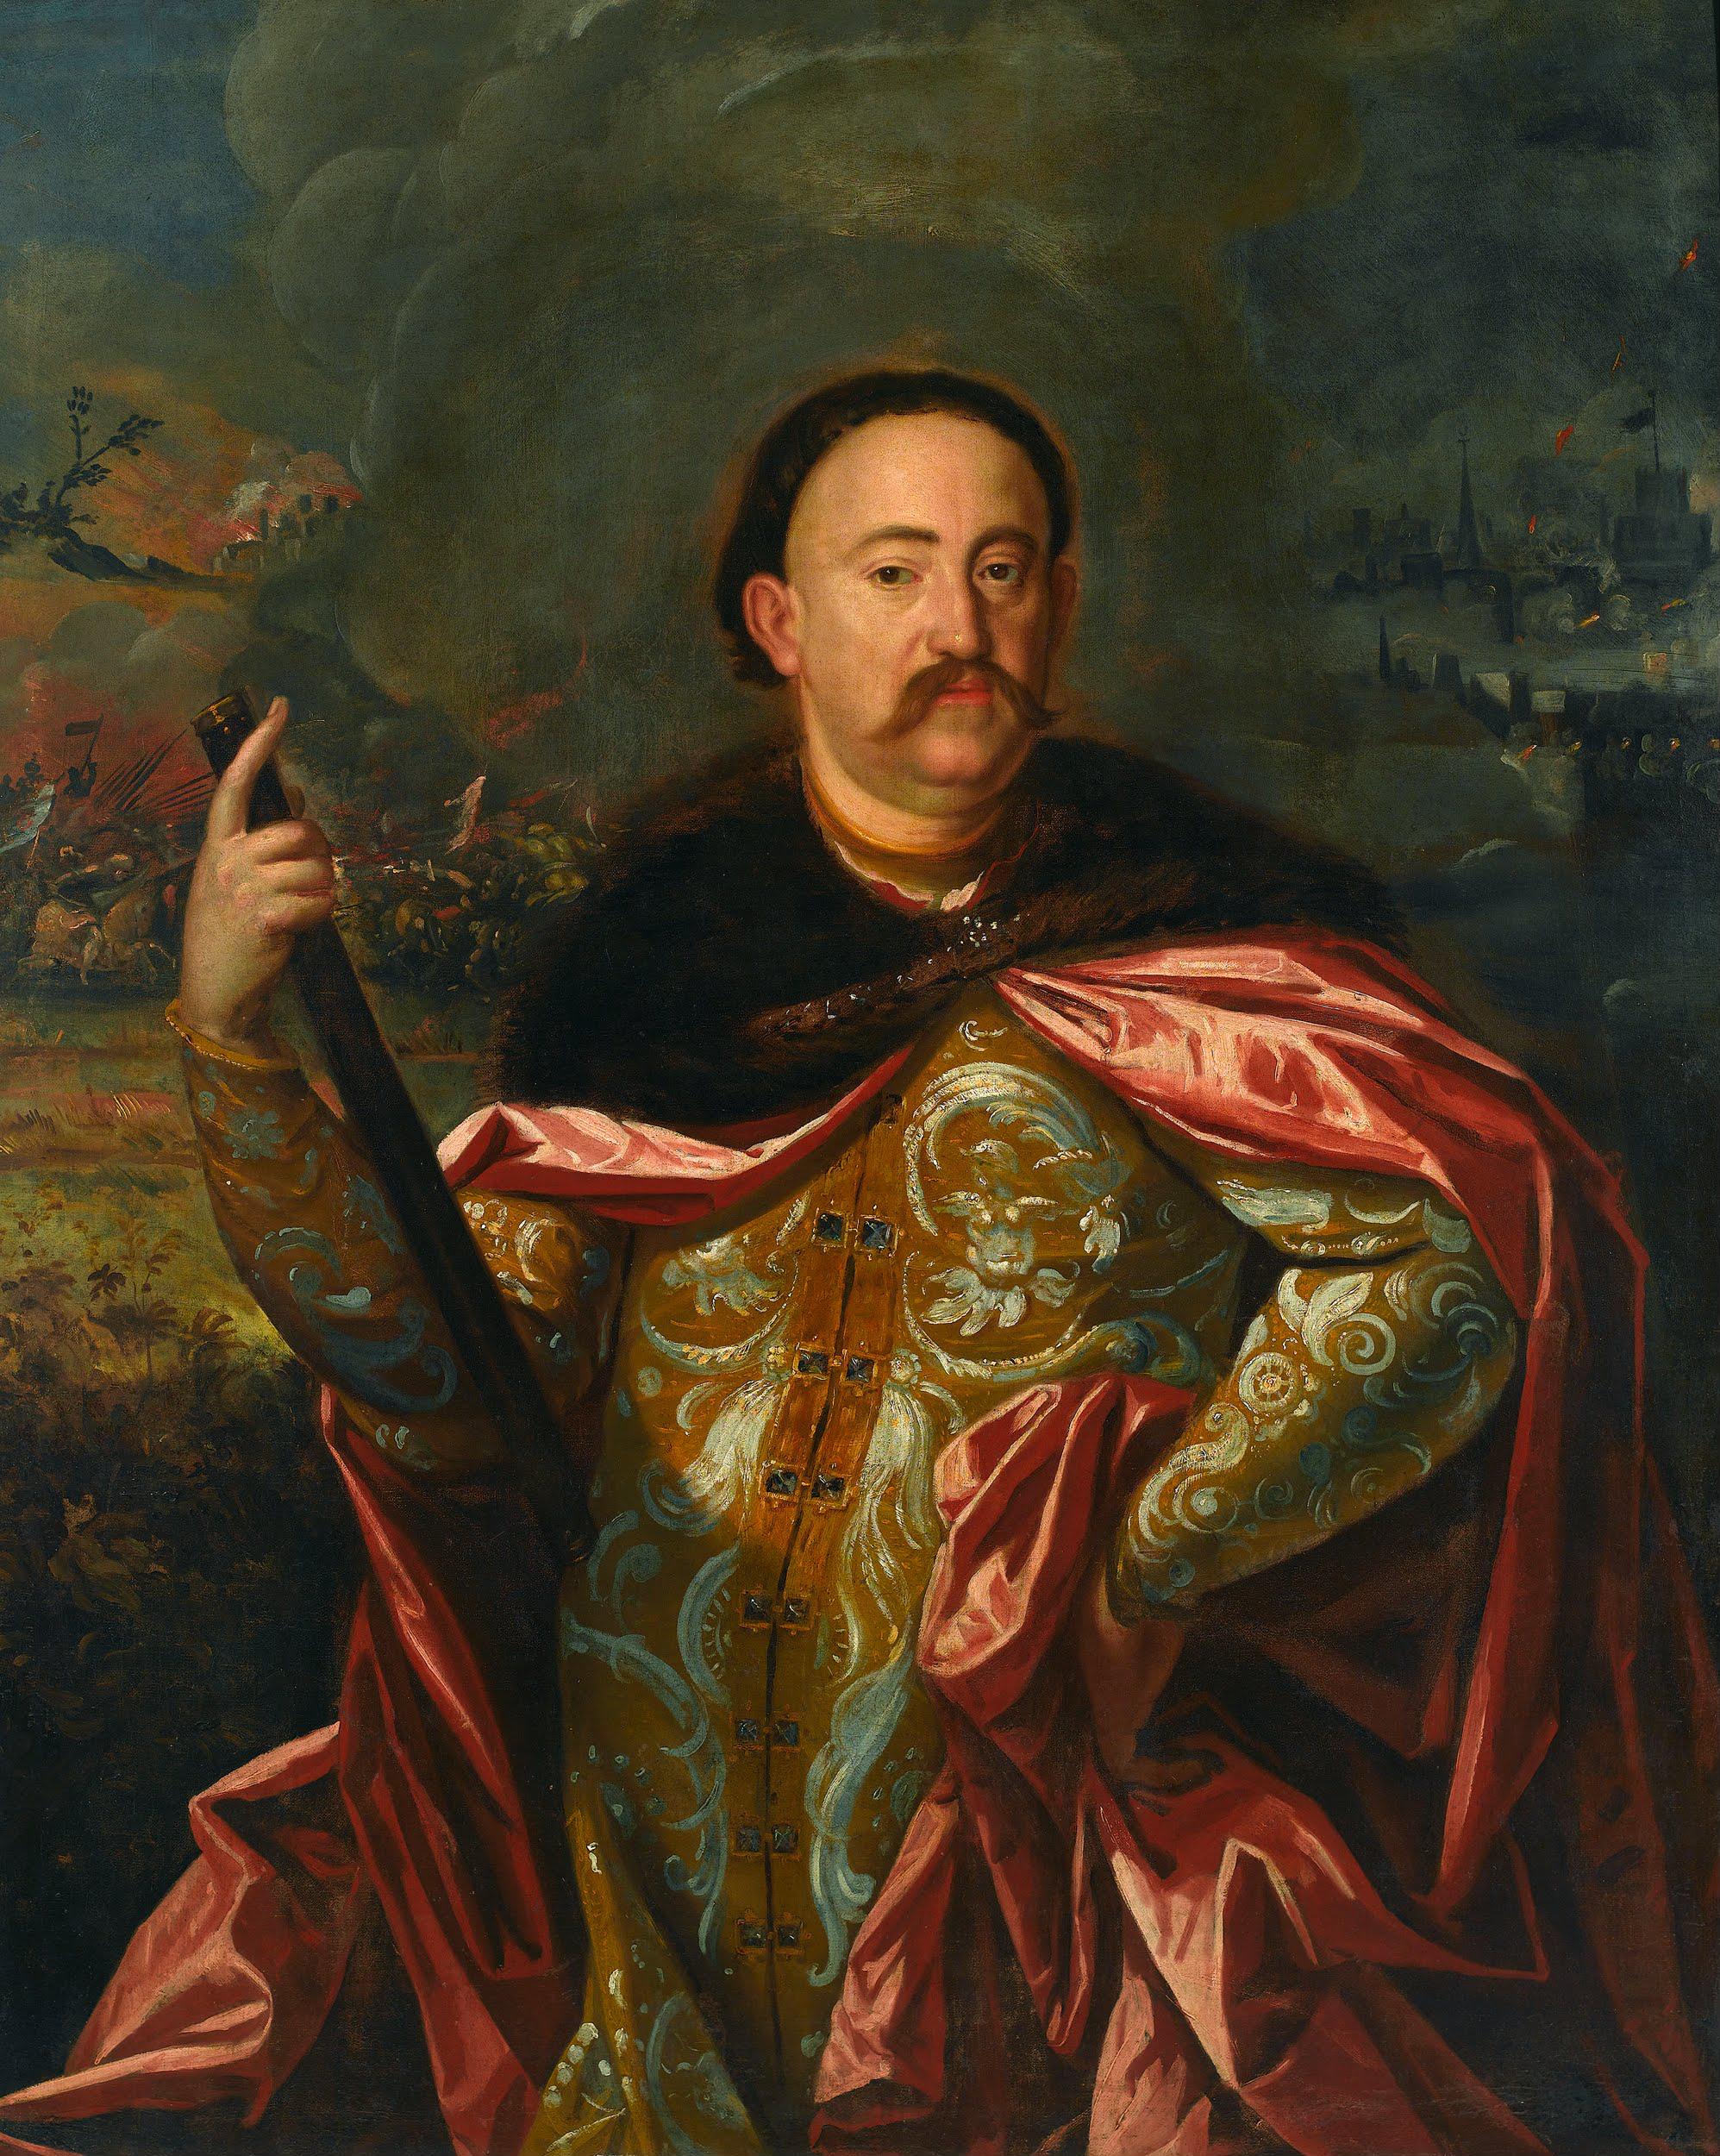 https://upload.wikimedia.org/wikipedia/commons/6/6c/Anonymous_-_Portrait_of_John_III_Sobieski_%284th_quarter_of_XVII_century%29_-_Google_Art_Project.jpg